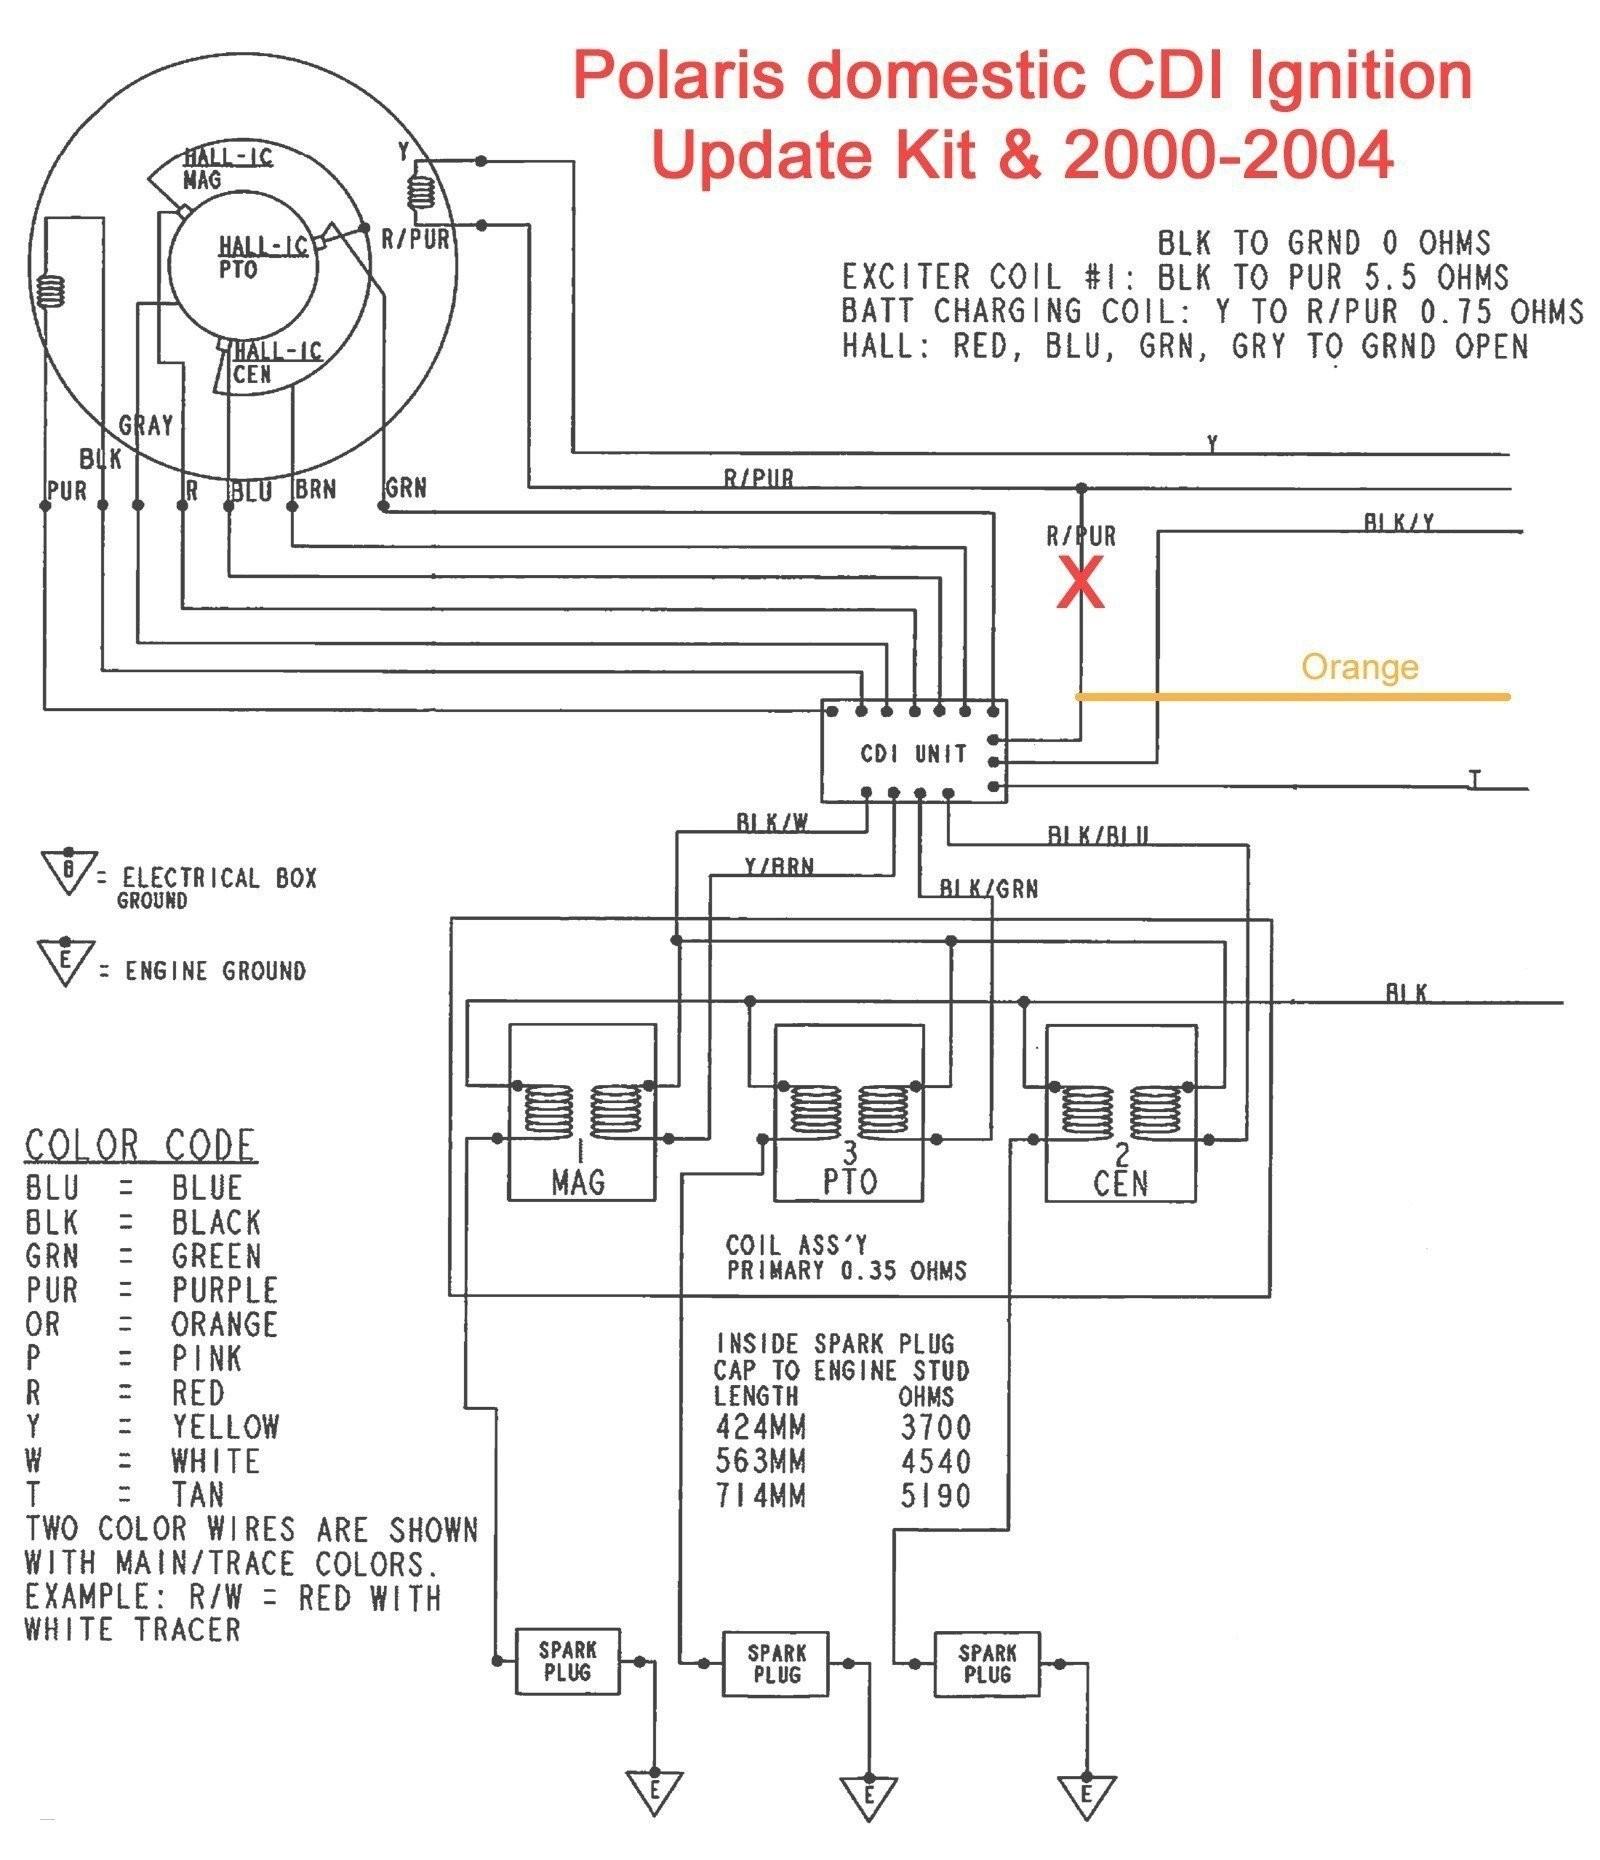 2001 Polaris 90 Wiring Diagram -Wiring A 250v Receptacle | Begeboy Wiring  Diagram SourceBegeboy Wiring Diagram Source